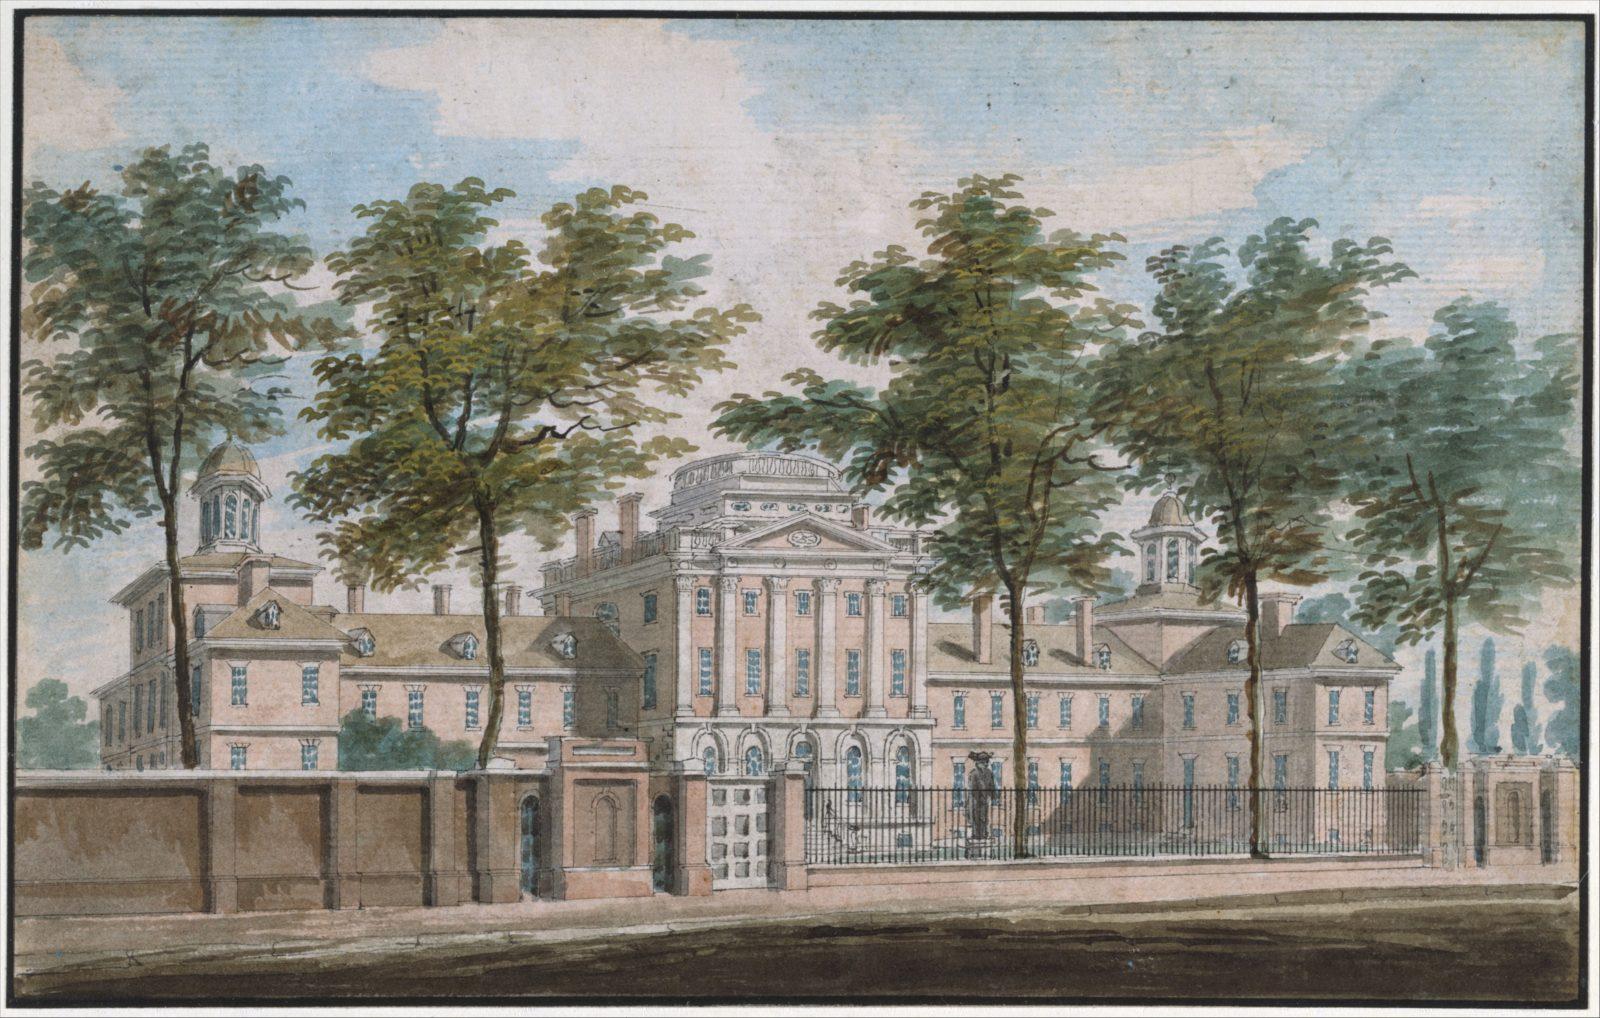 The Pennsylvania Hospital, Philadelphia